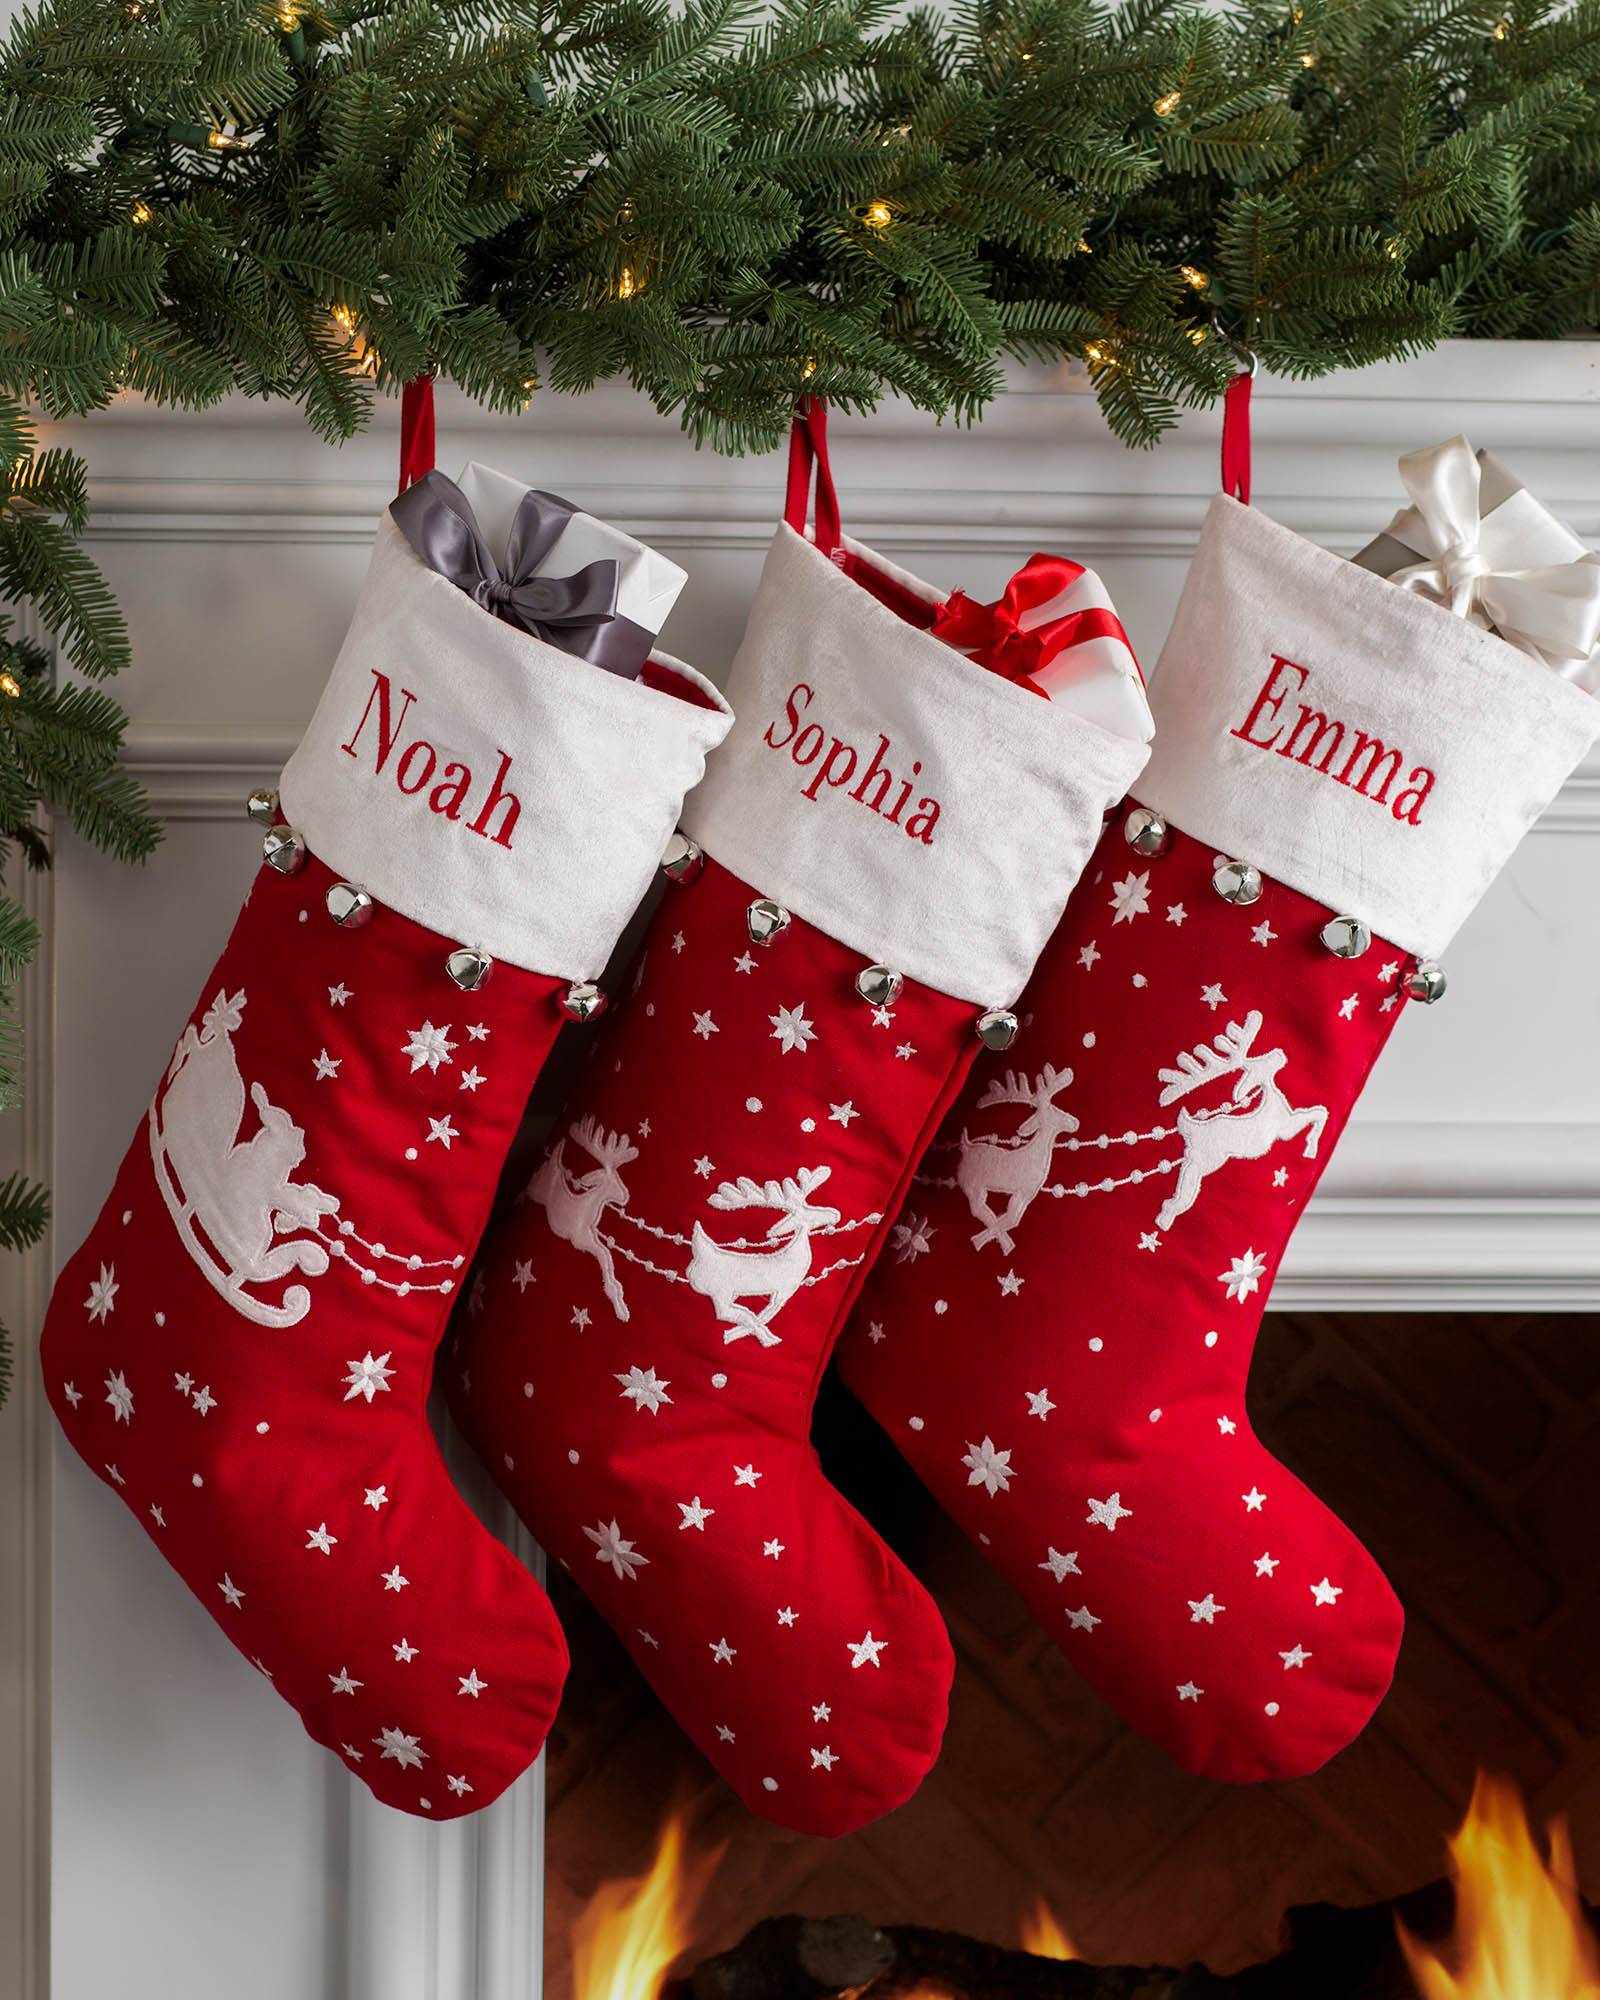 Stocking Christmas.Dashing Through The Snow Stocking Balsam Hill